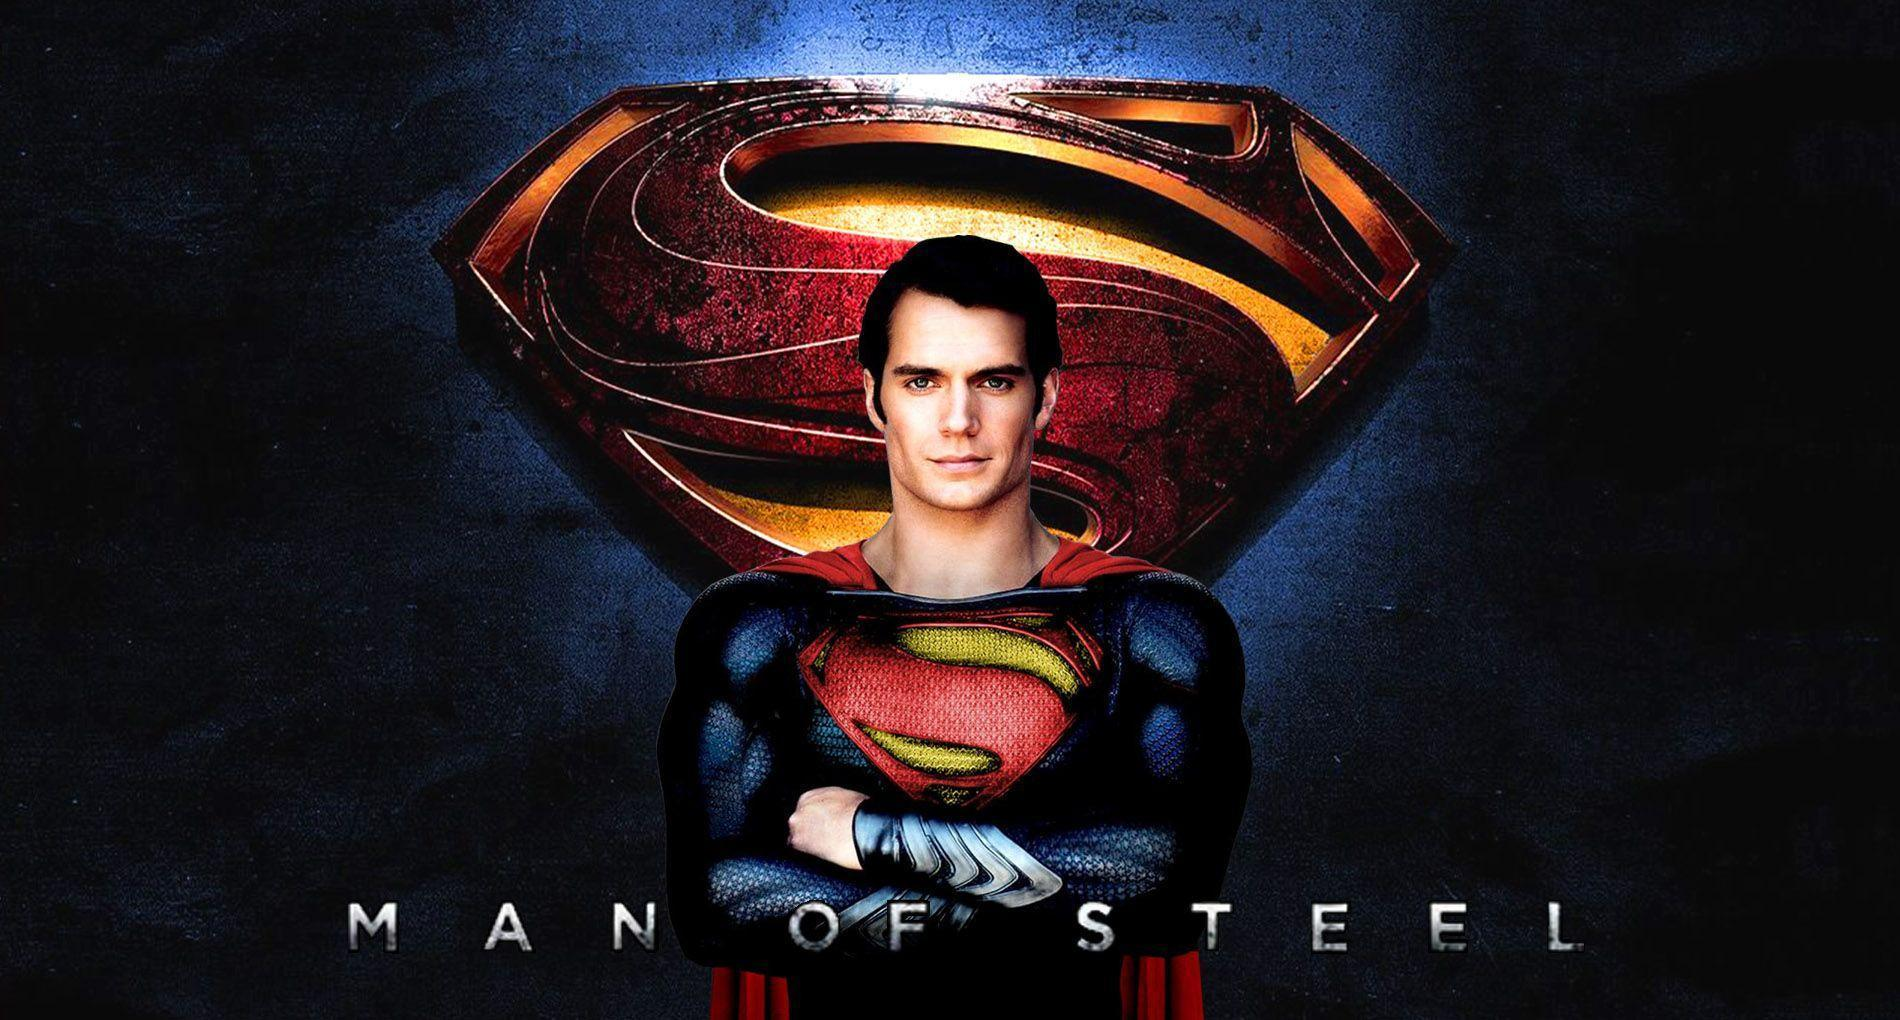 Brandon routh wallpapers wallpaper cave - Wallpaper superman man of steel ...